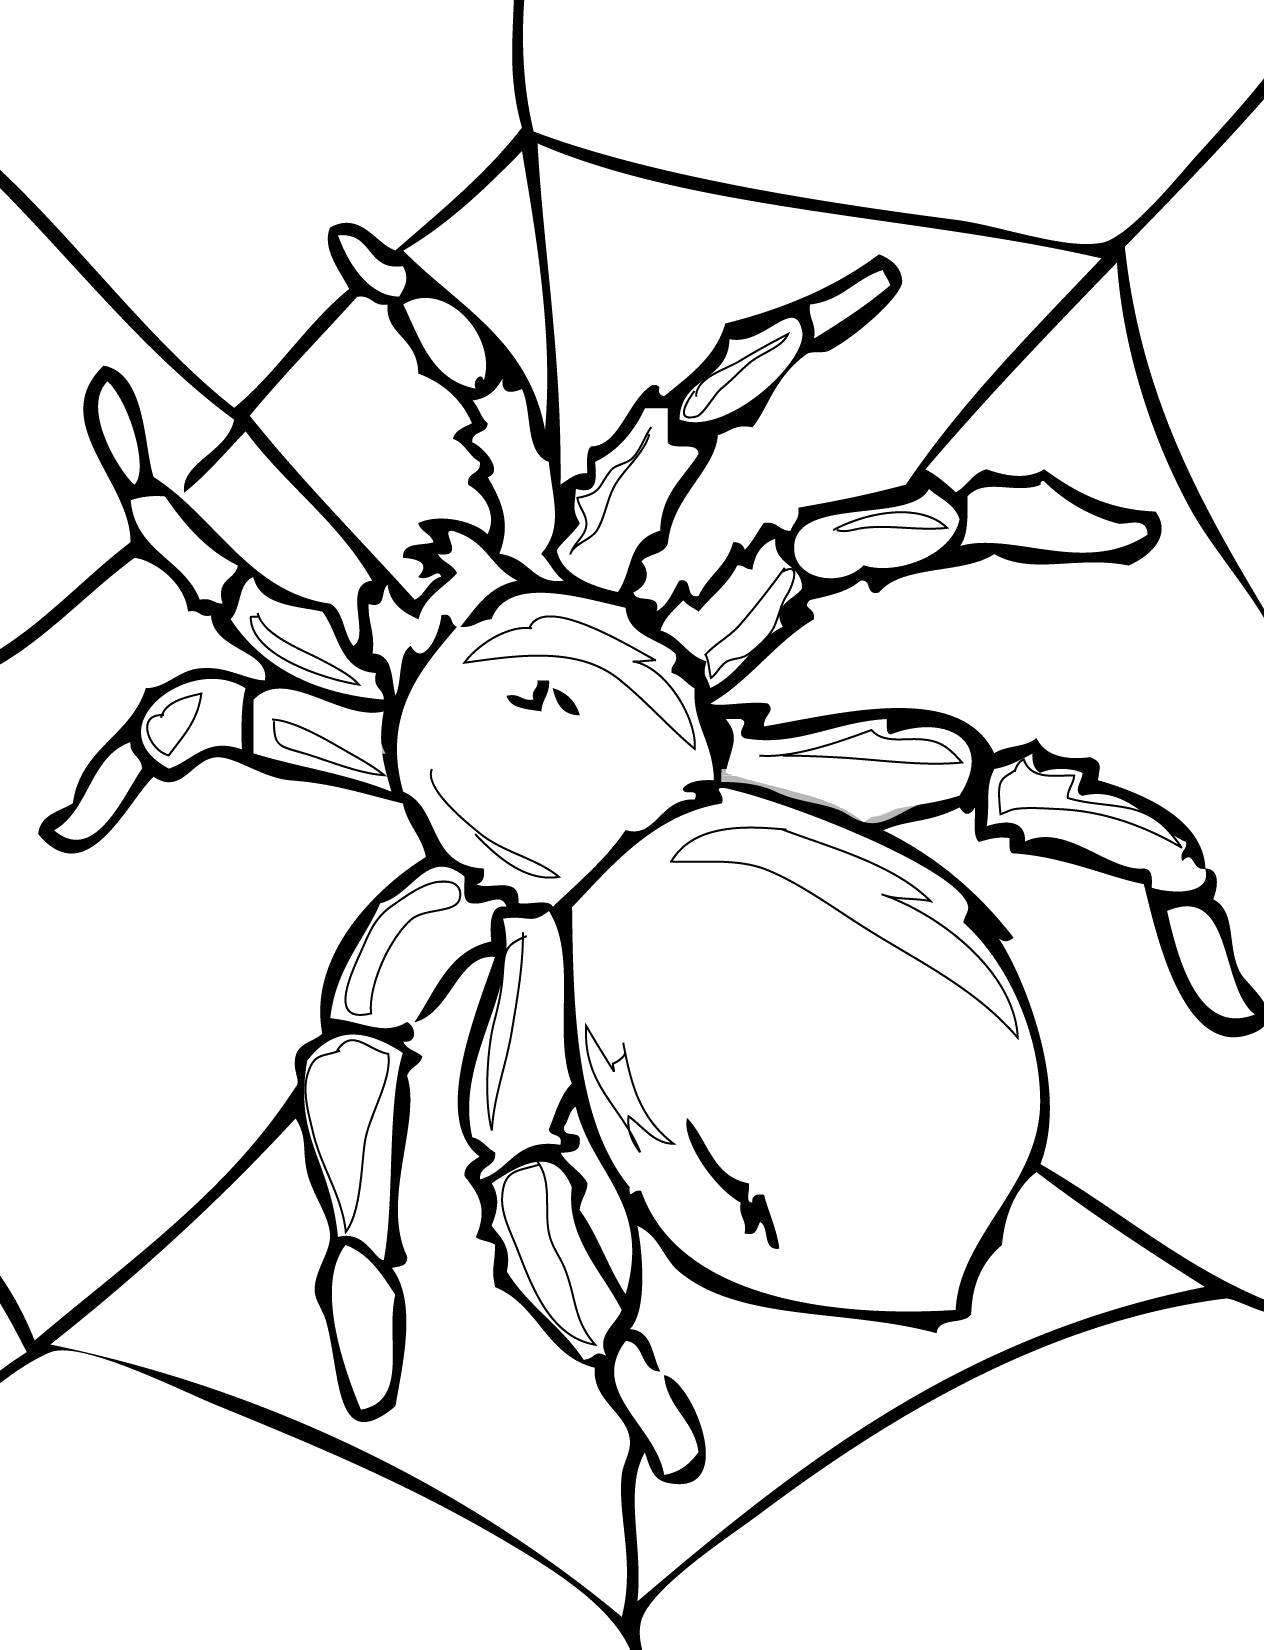 Раскраска паук раскраска. Насекомые